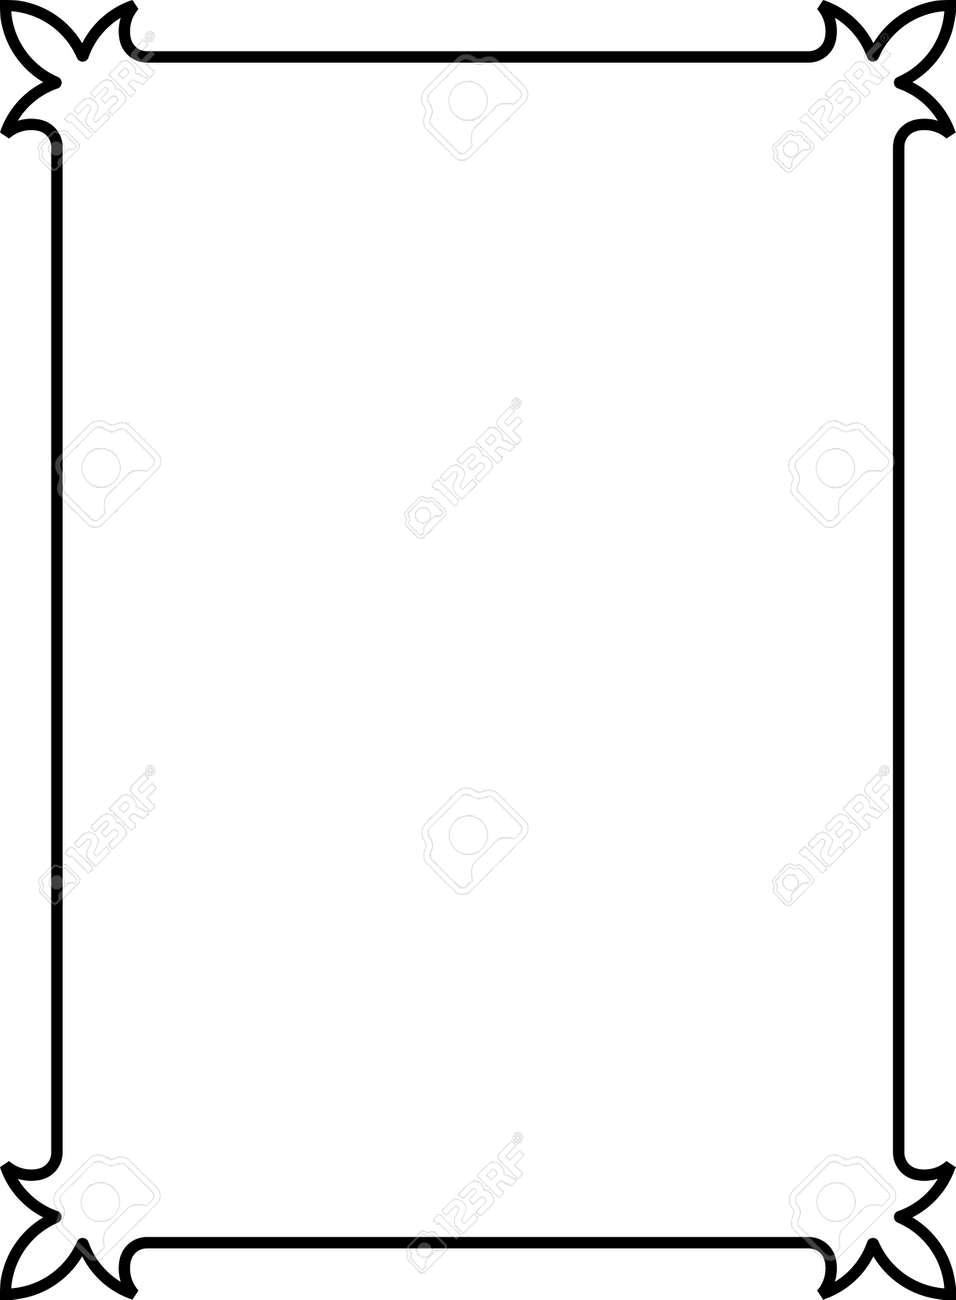 simple vintage vector border frame royalty free cliparts vectors rh 123rf com border vectors free download border vector art